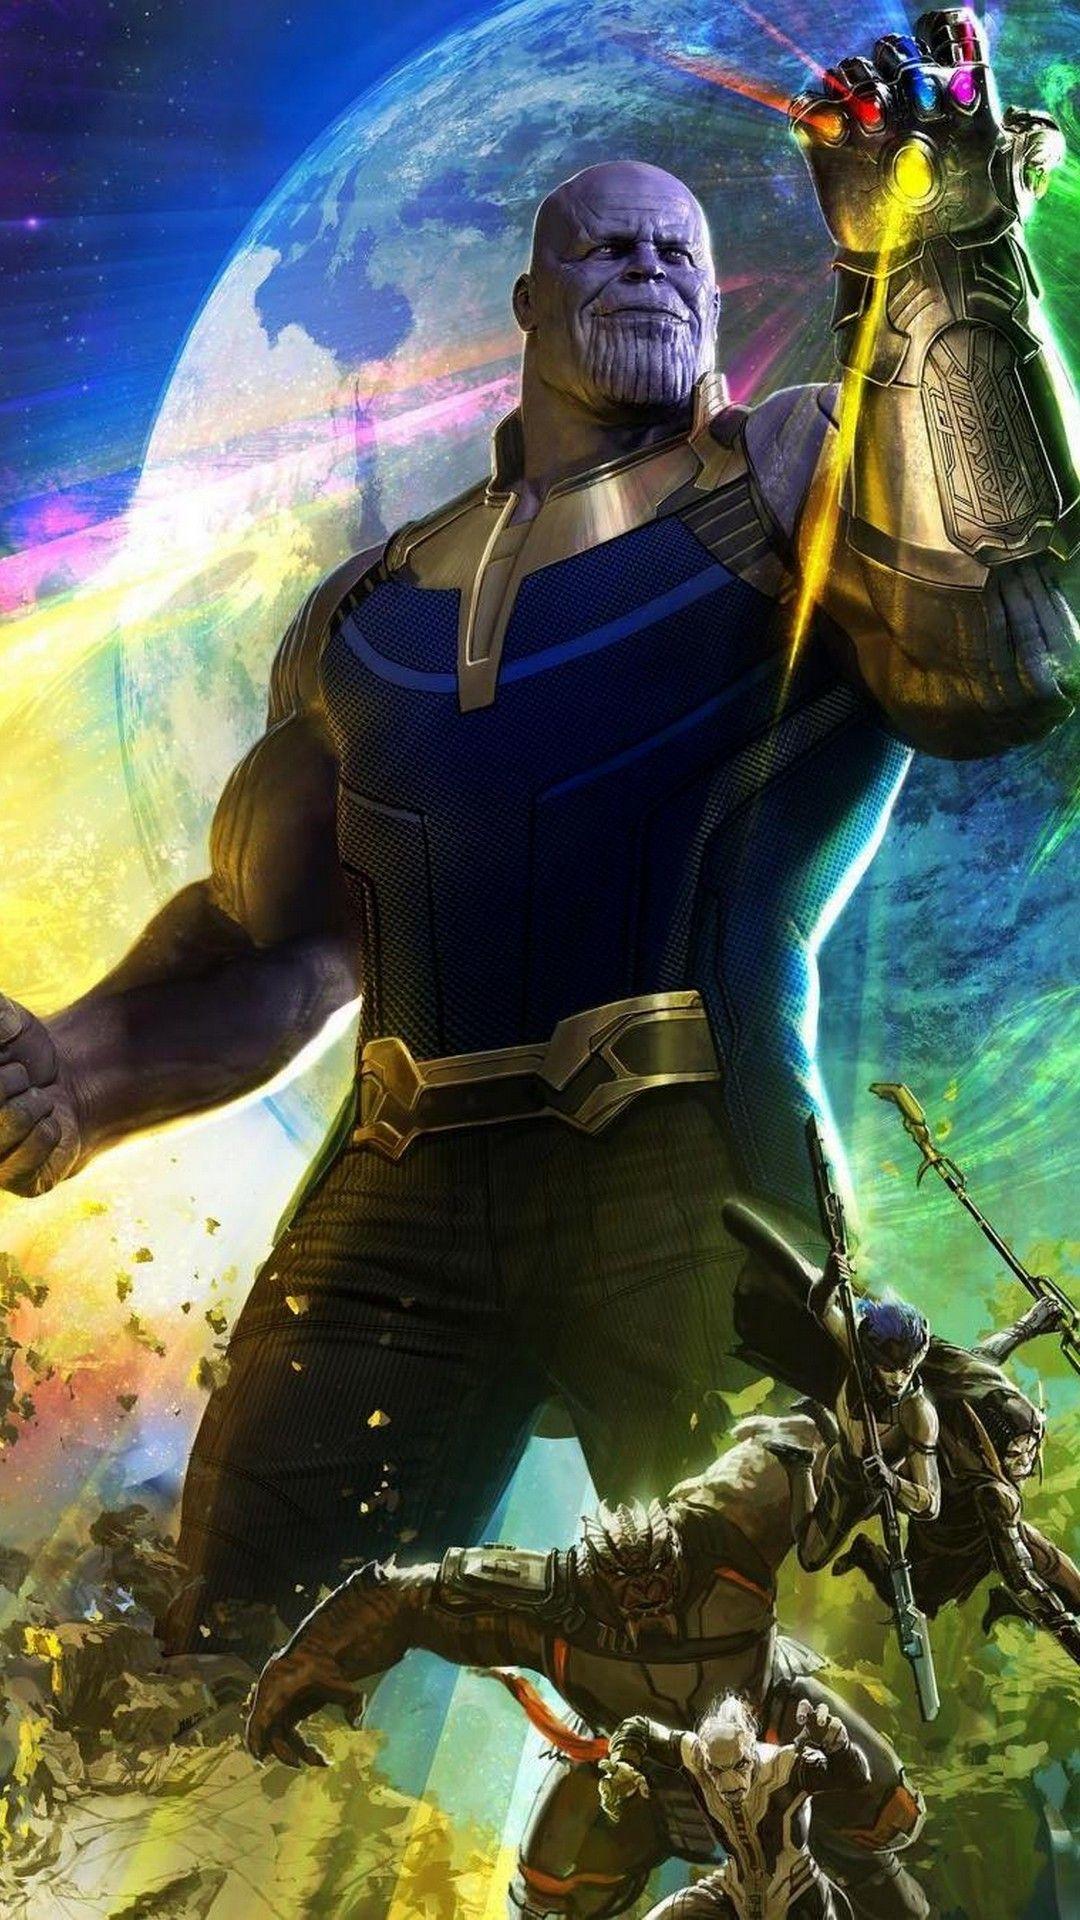 Iphone Wallpaper Avengers Infinity War Characters Best Iphone Wallpaper Marvel Comics Art Avengers Marvel